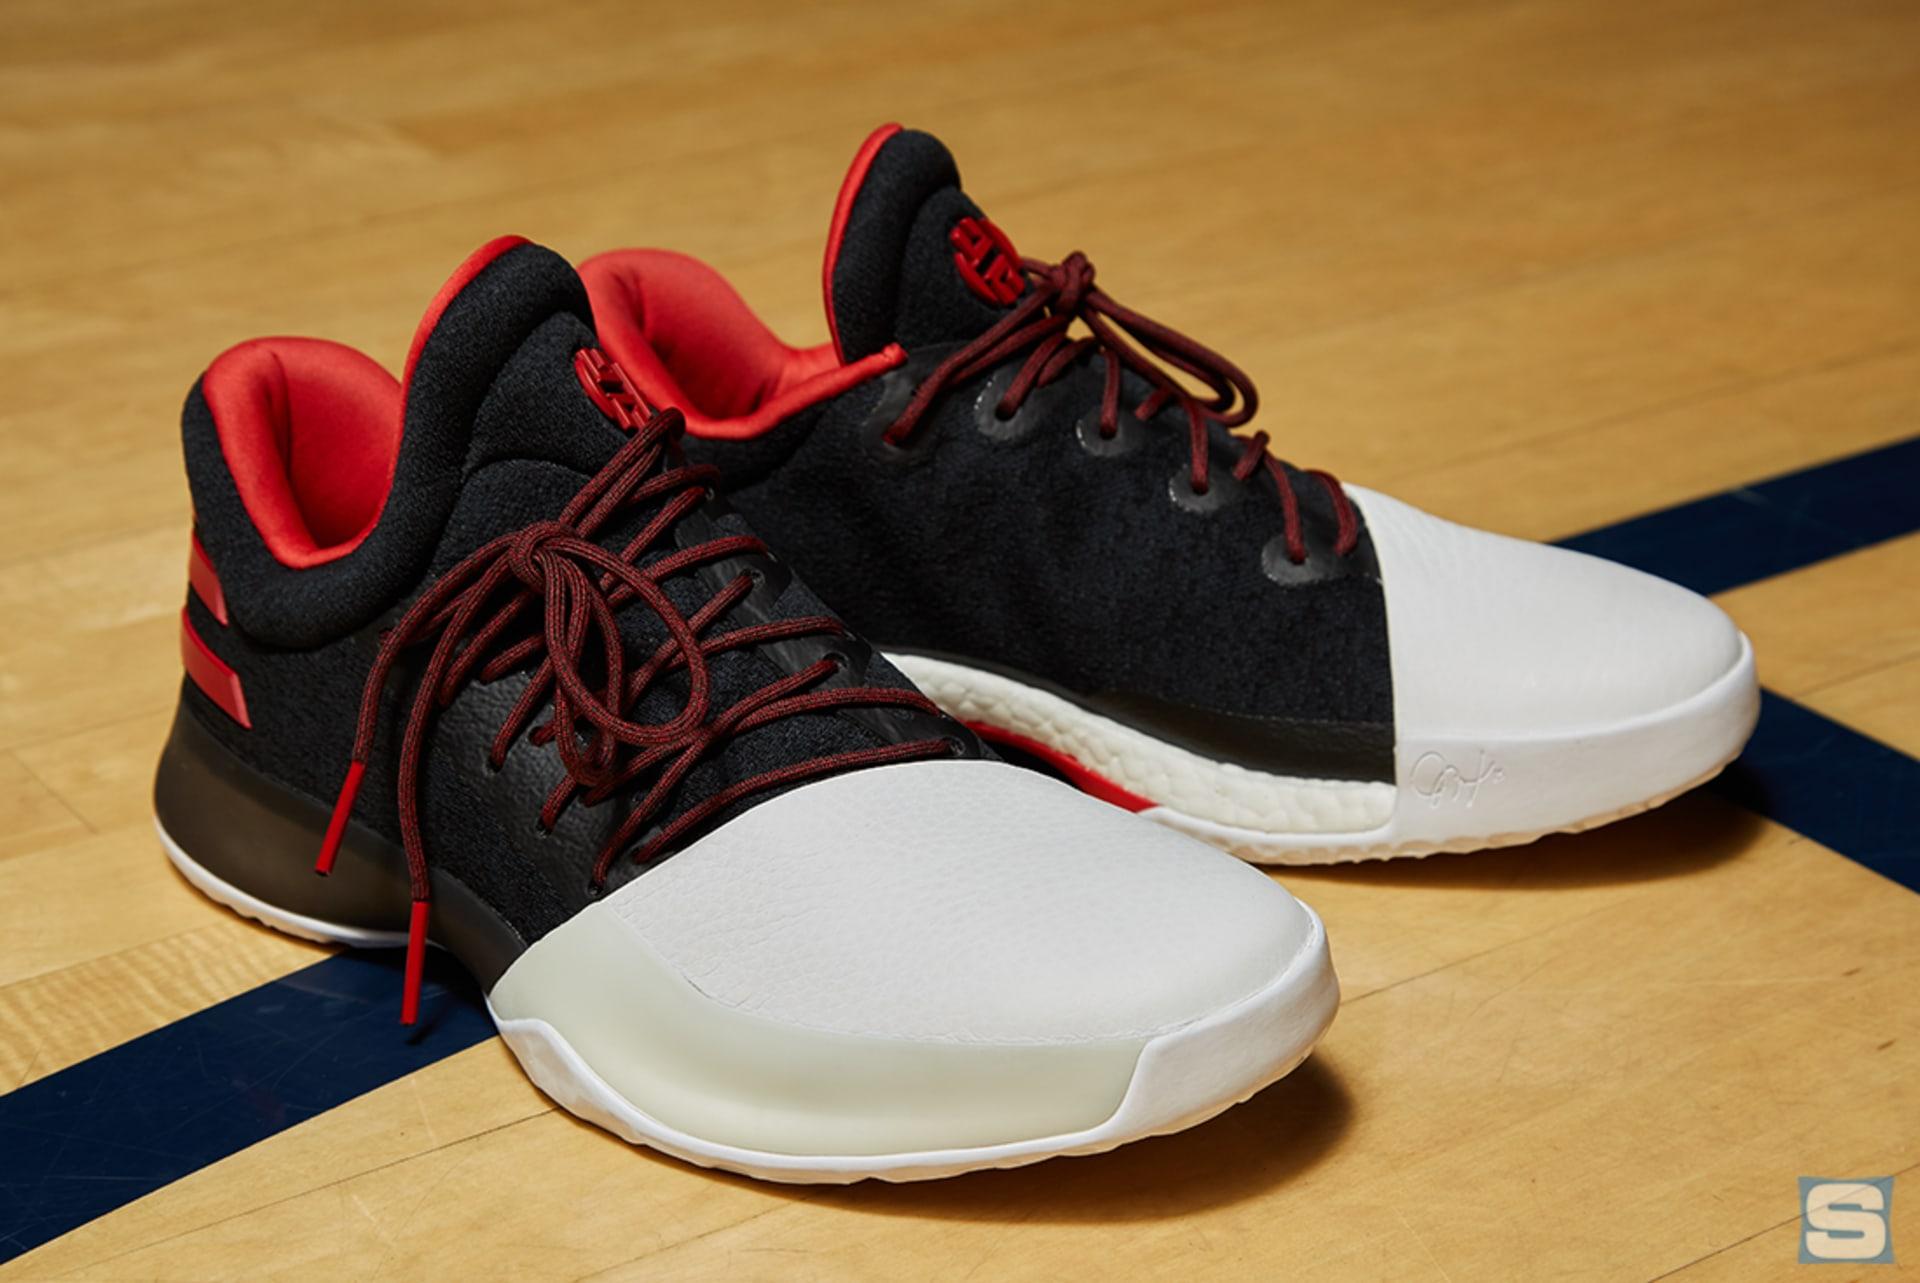 b7adfa835ac0 Adidas James Harden Vol. 1 Sneaker Release Date